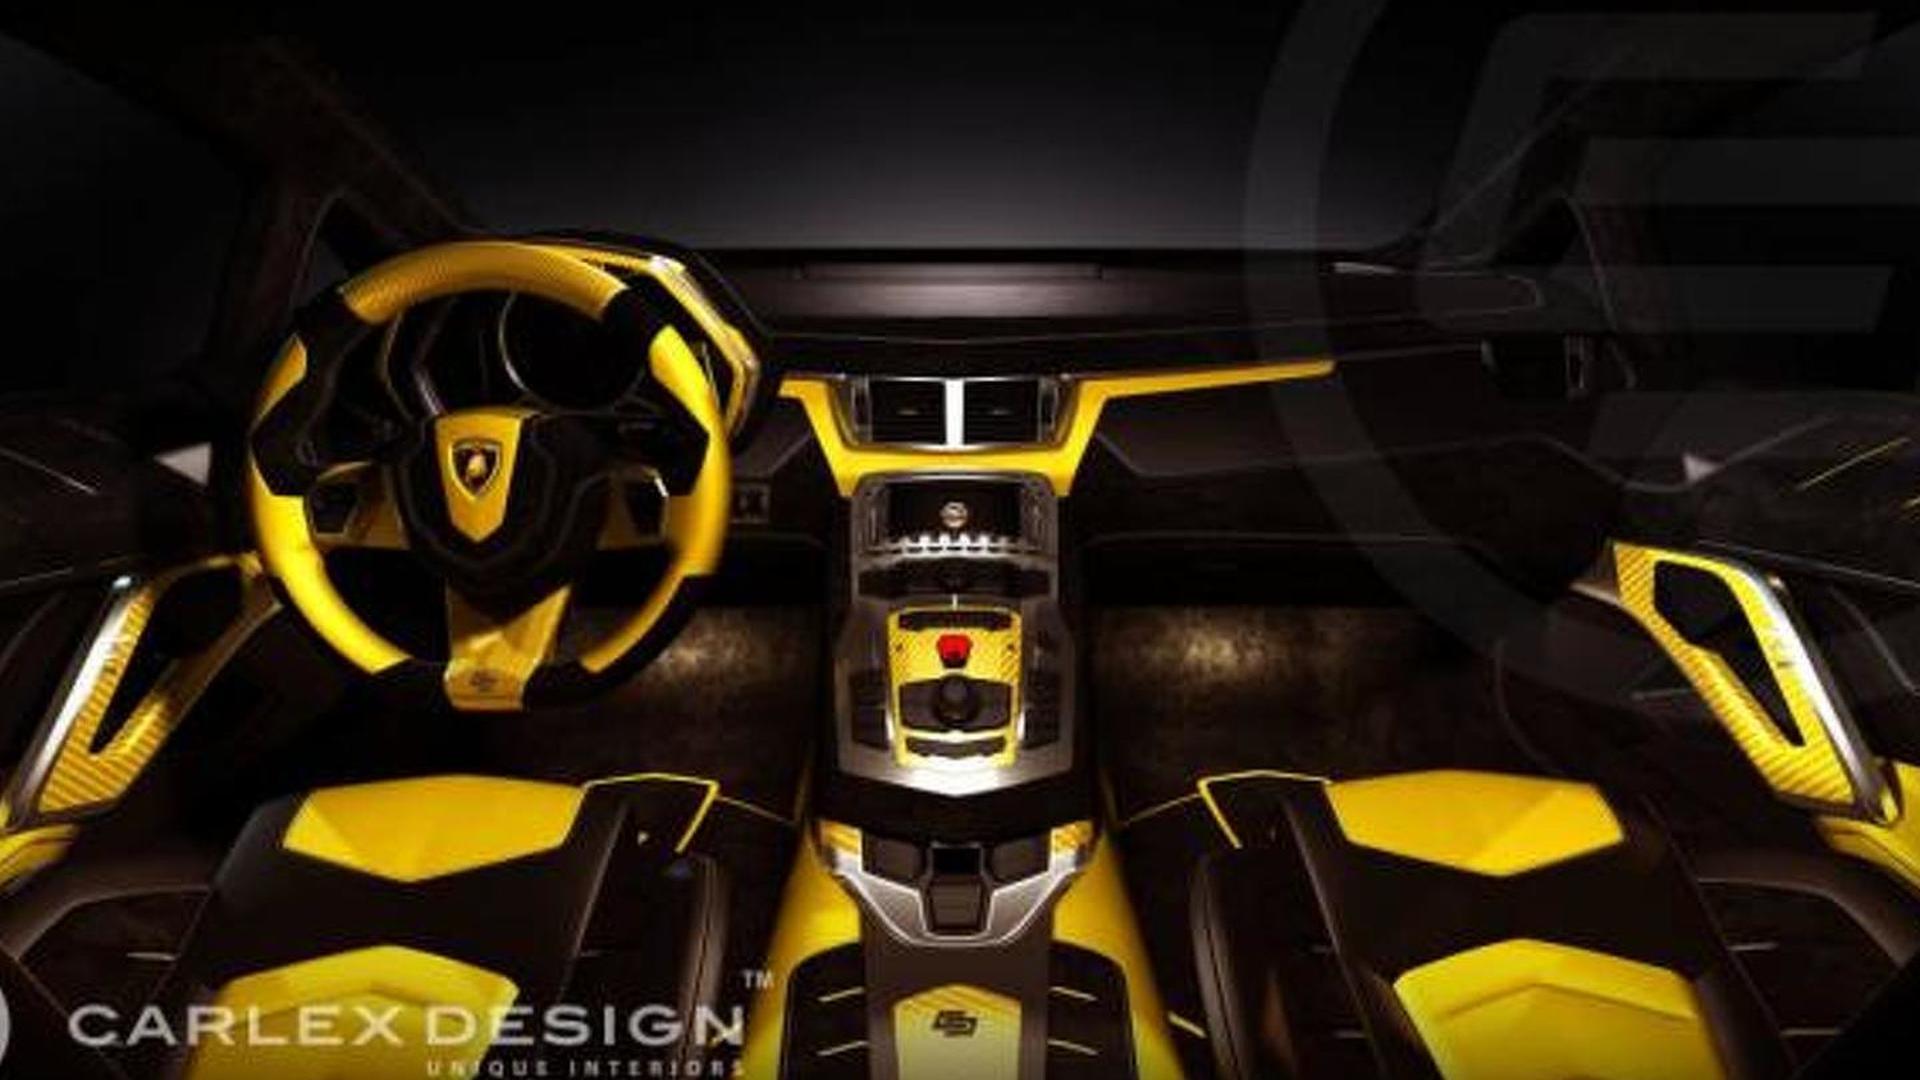 Lamborghini Aventador Anniversario interior restyled by Carlex Design